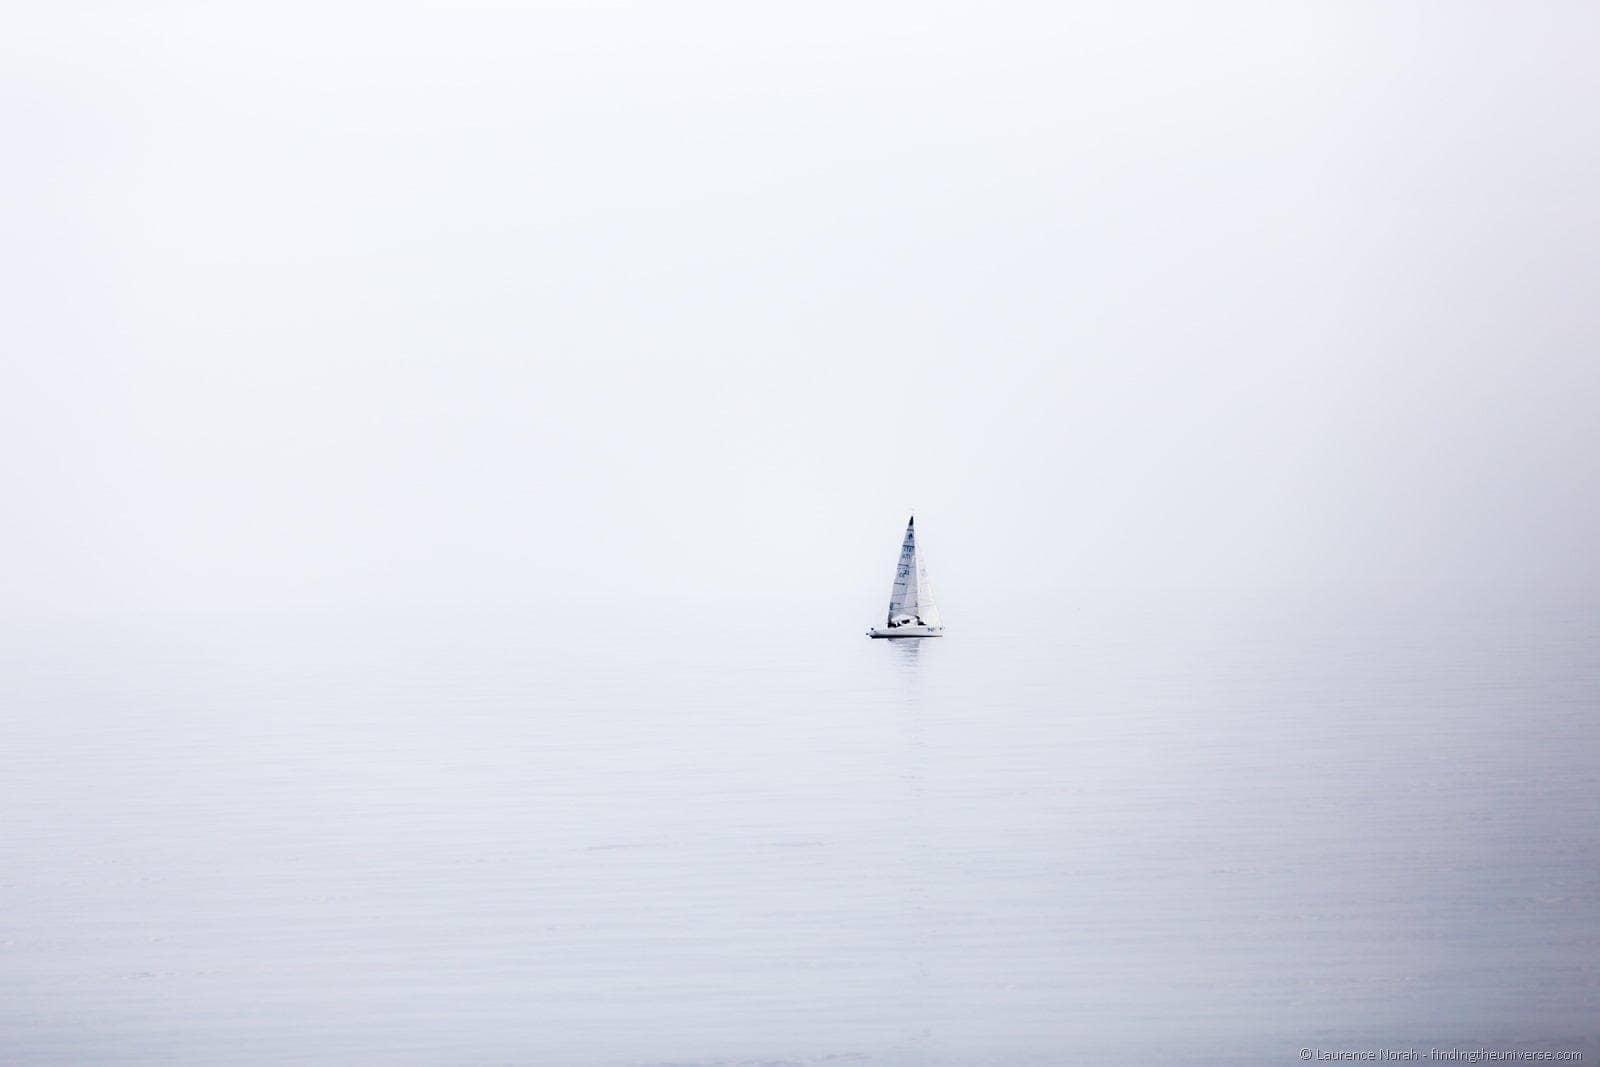 Sailboat on Lake Garda Italy